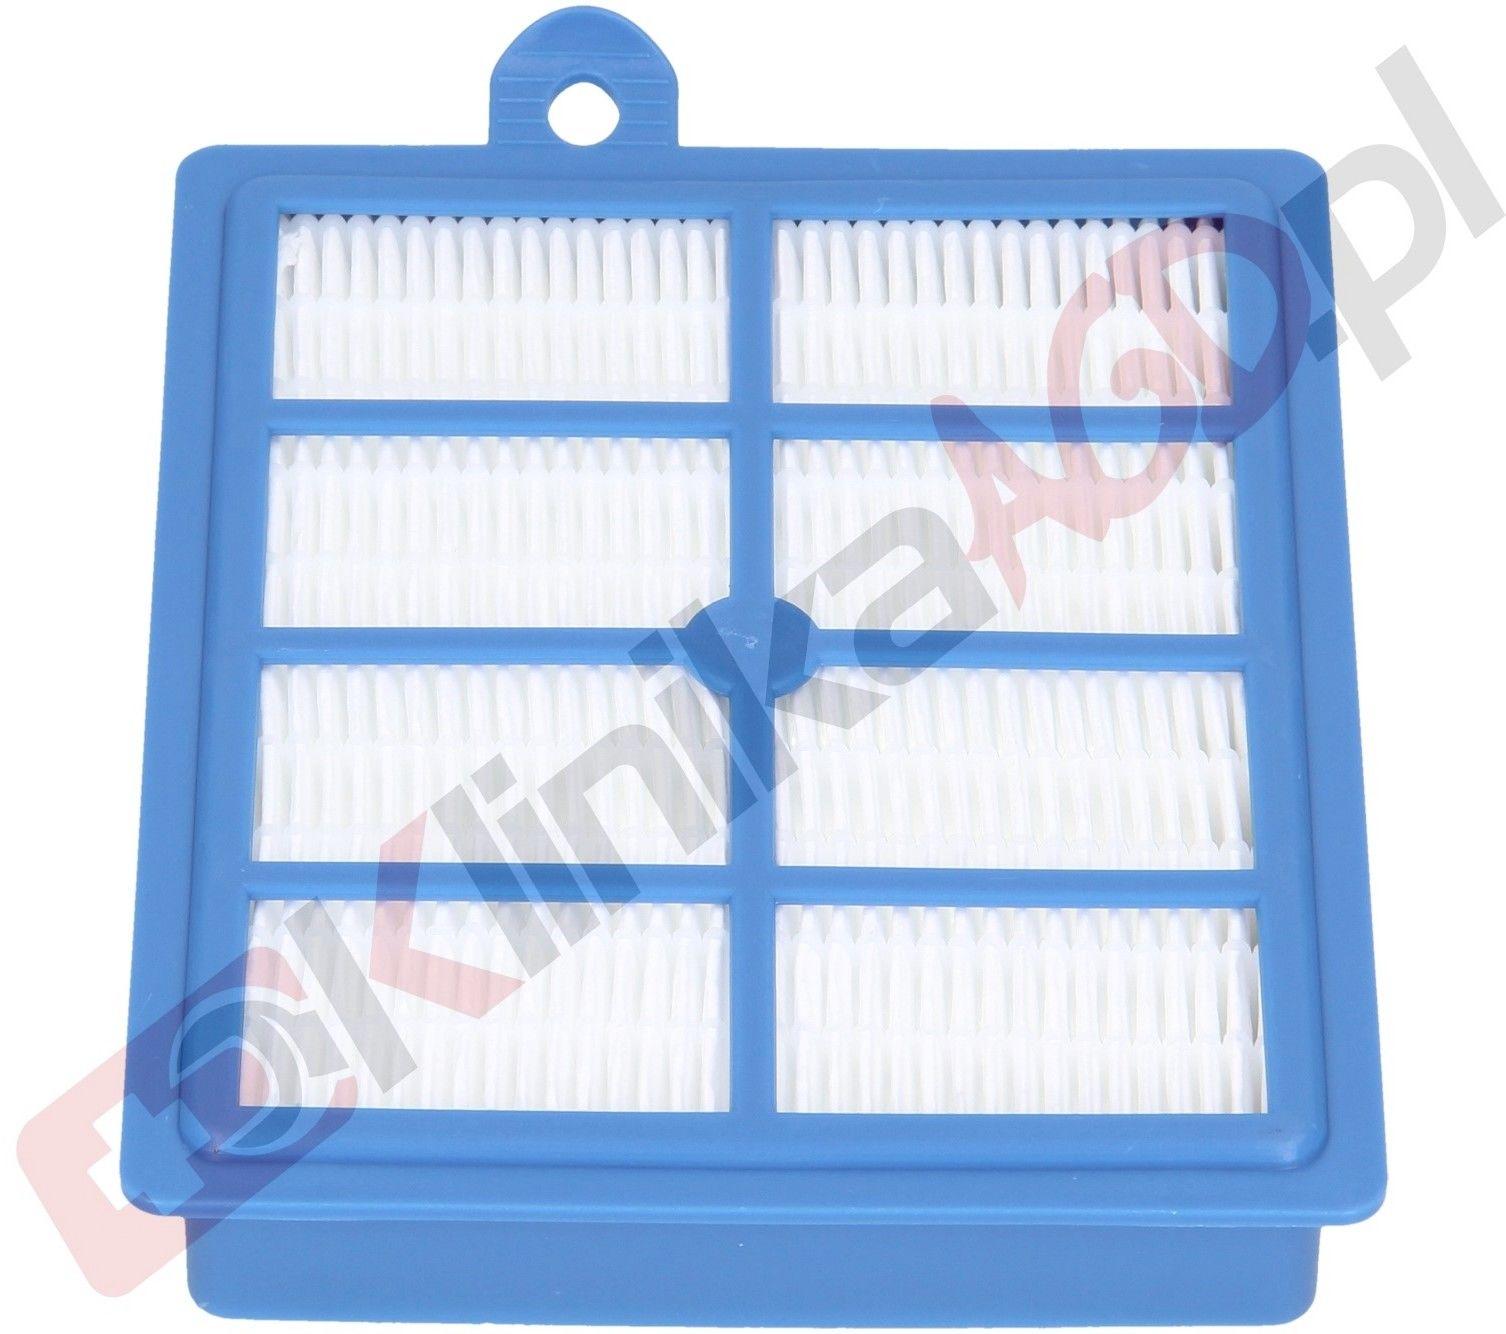 Electrolux AEG 9001668657 USK6 Zestaw filtrów do odkurzacza UltraPerformer UltraActive, EFH12W, 9001661595, 9001664409